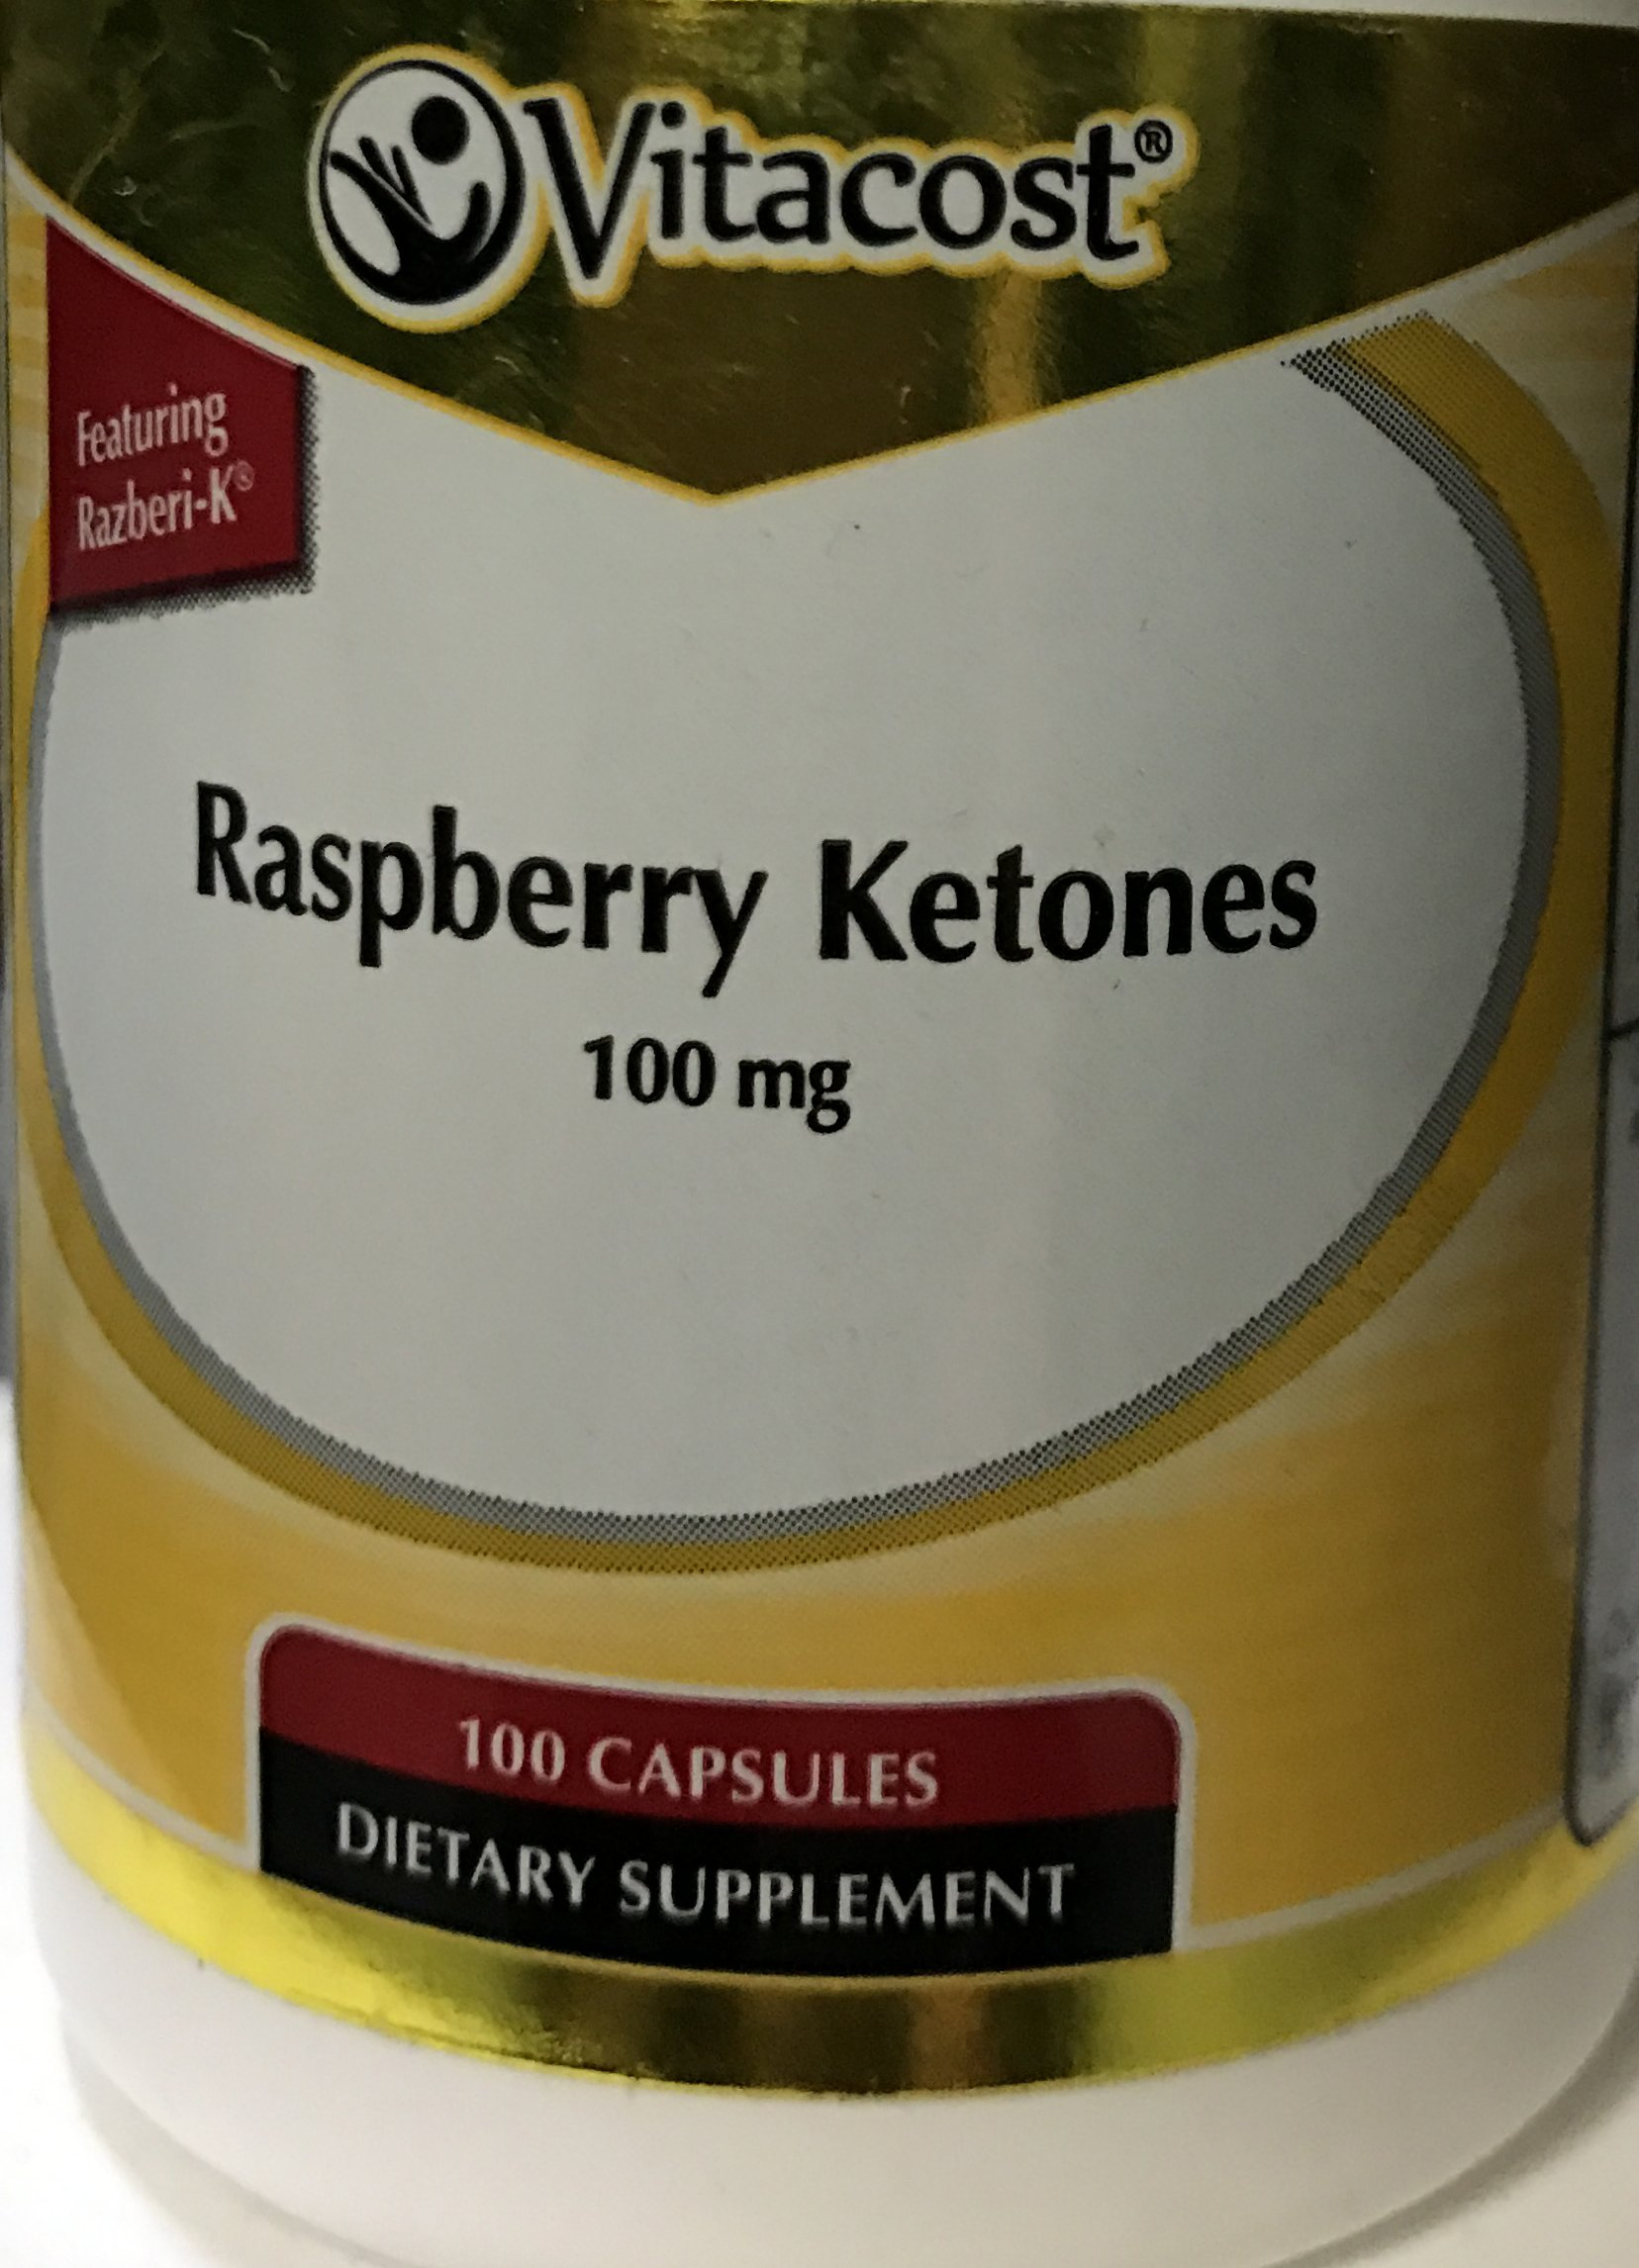 Vitacost Raspberry Ketones Featuring Razberi-K -- 100 mg - 100 Capsules